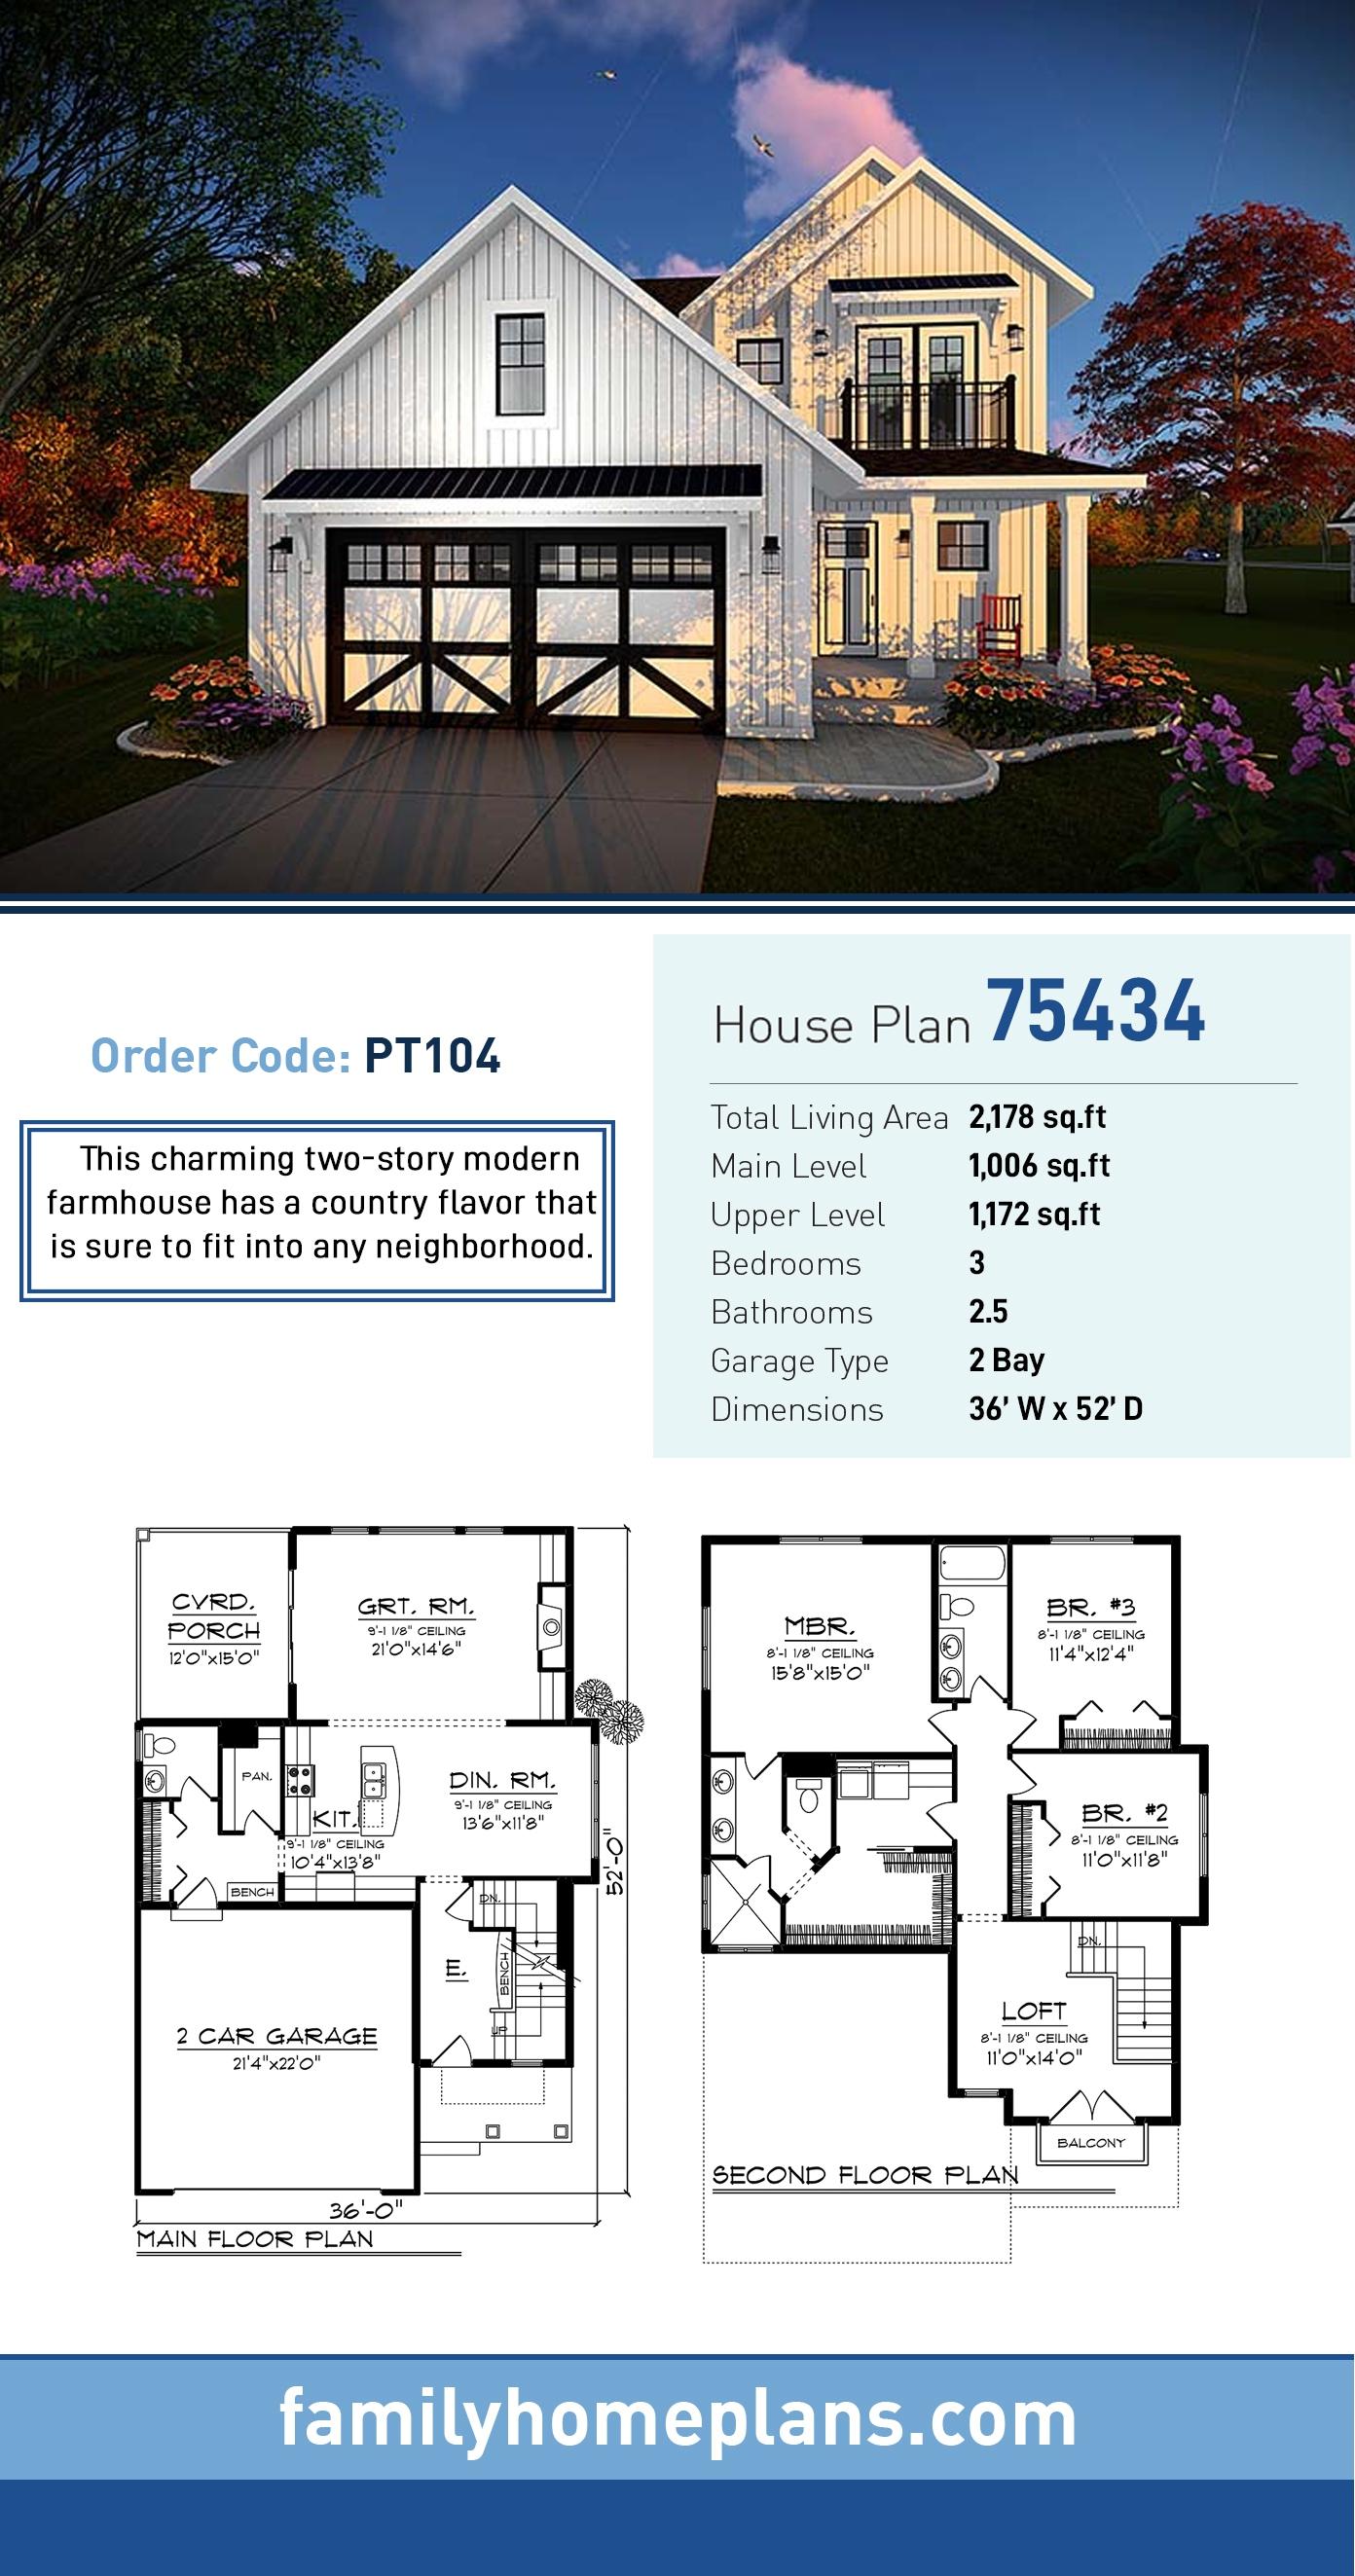 Cottage, Craftsman, Farmhouse House Plan 75434 with 3 Beds, 3 Baths, 2 Car Garage